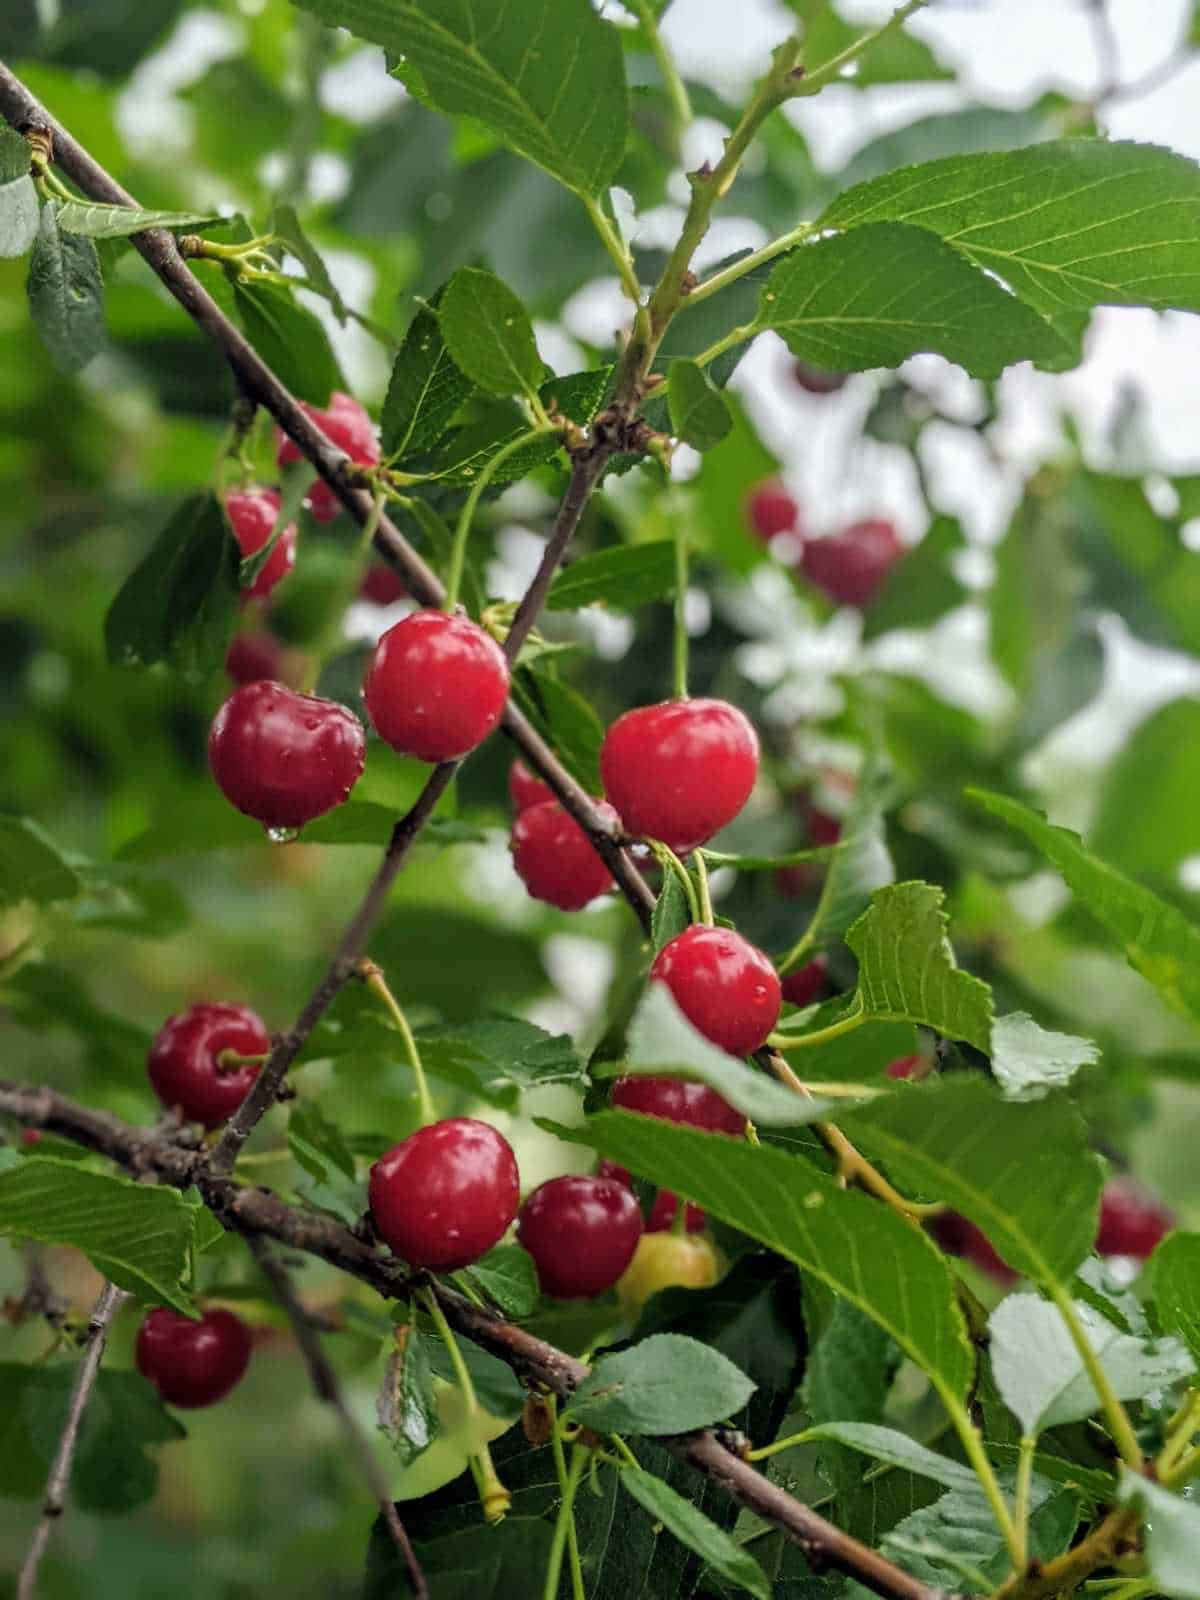 cherries in a tree